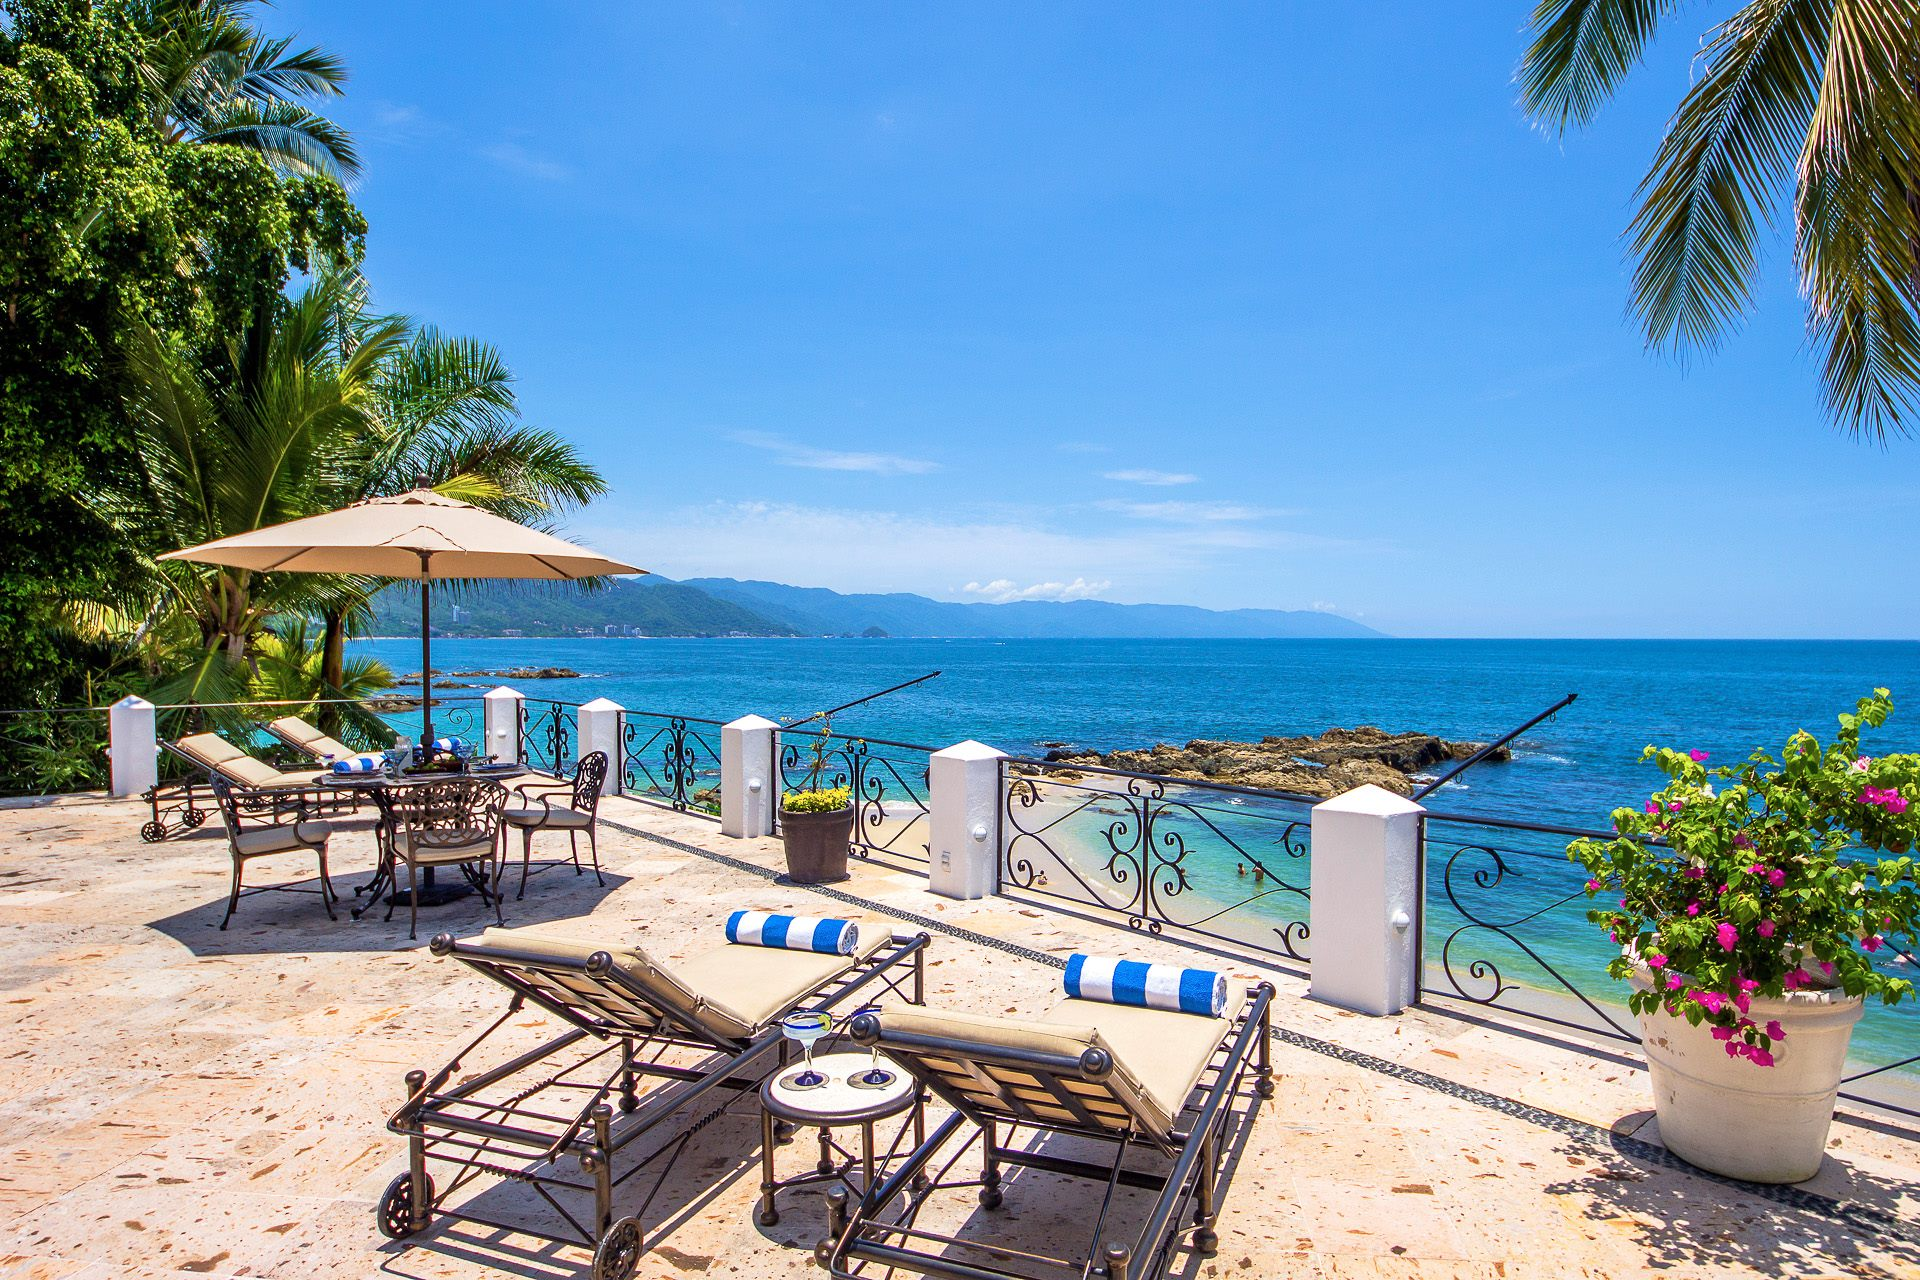 Vacation Vallarta Puerto Vallarta Mexican Riviera Vacation Rental Property